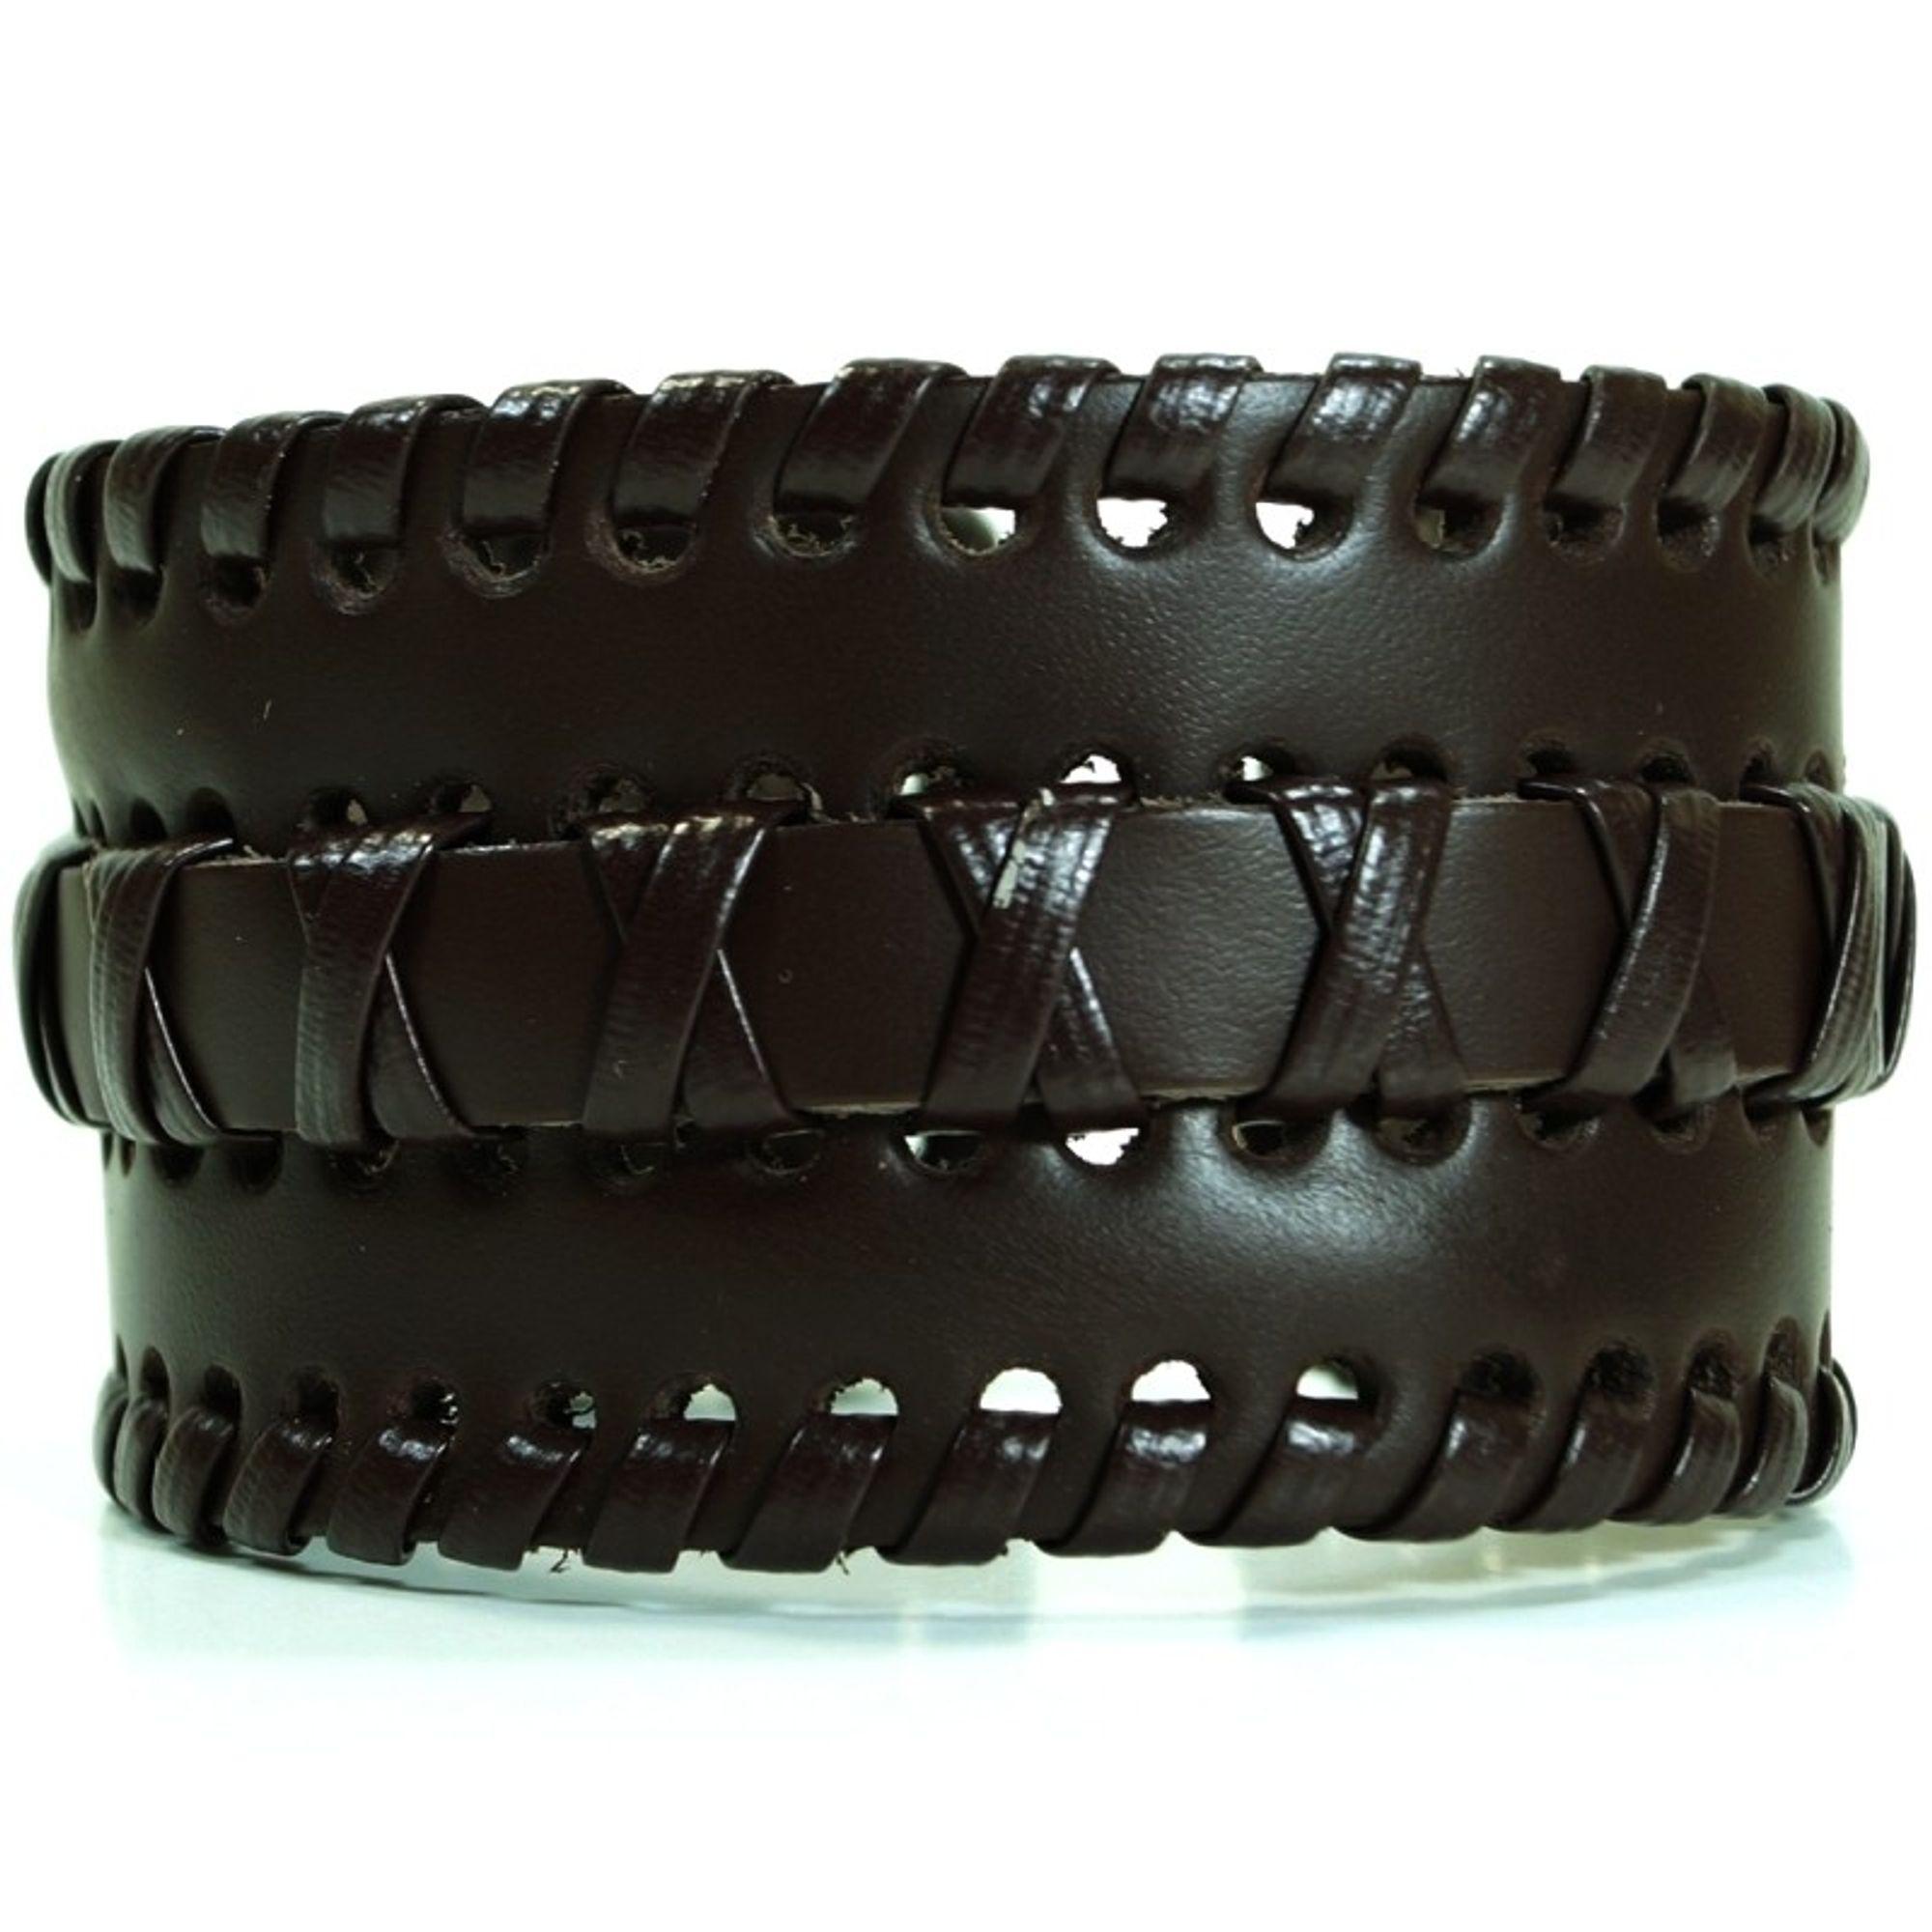 CJBB3990 Herren Armband Leder braun 23,5 cm